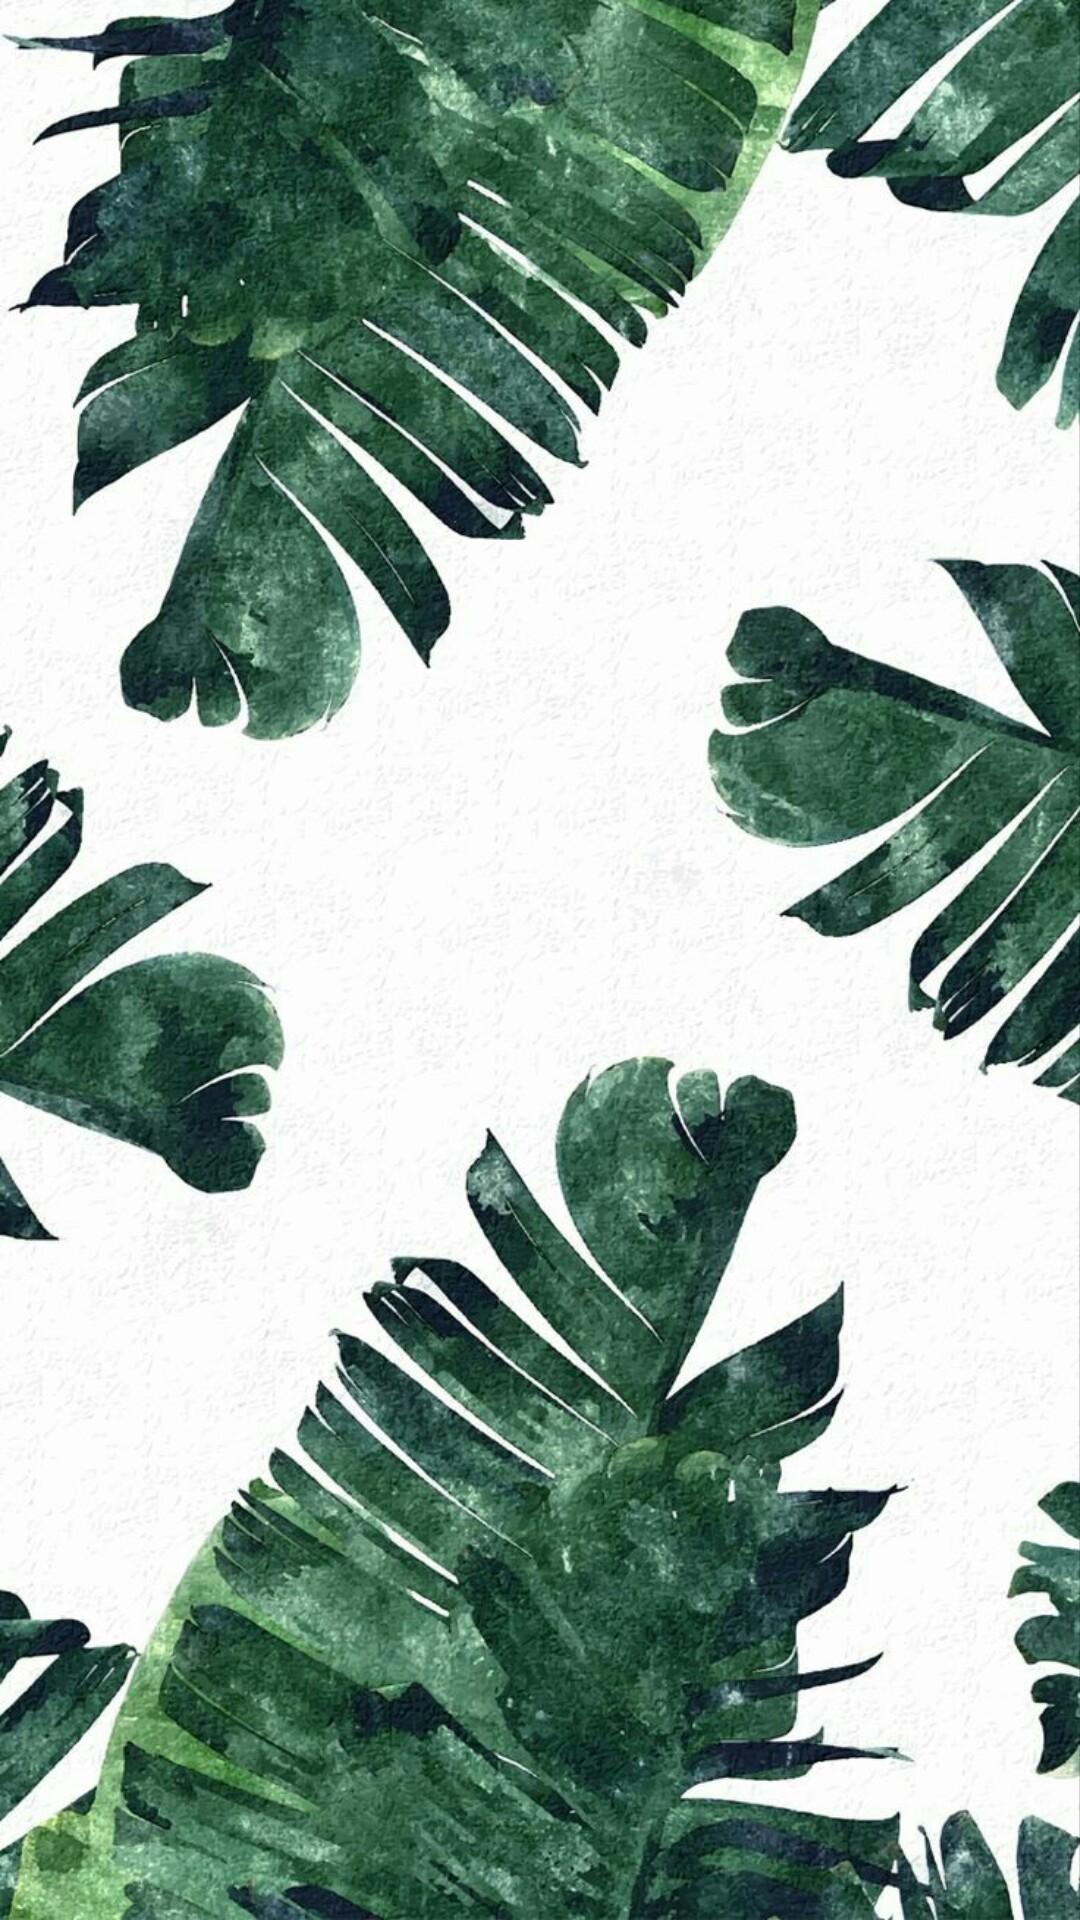 Large Image For Asclepias Incarnata Swamp Milkweed: แจกฟรี!!! Wallpaper ลายใบไม้ไว้ใช้ให้อินกับปี 2017